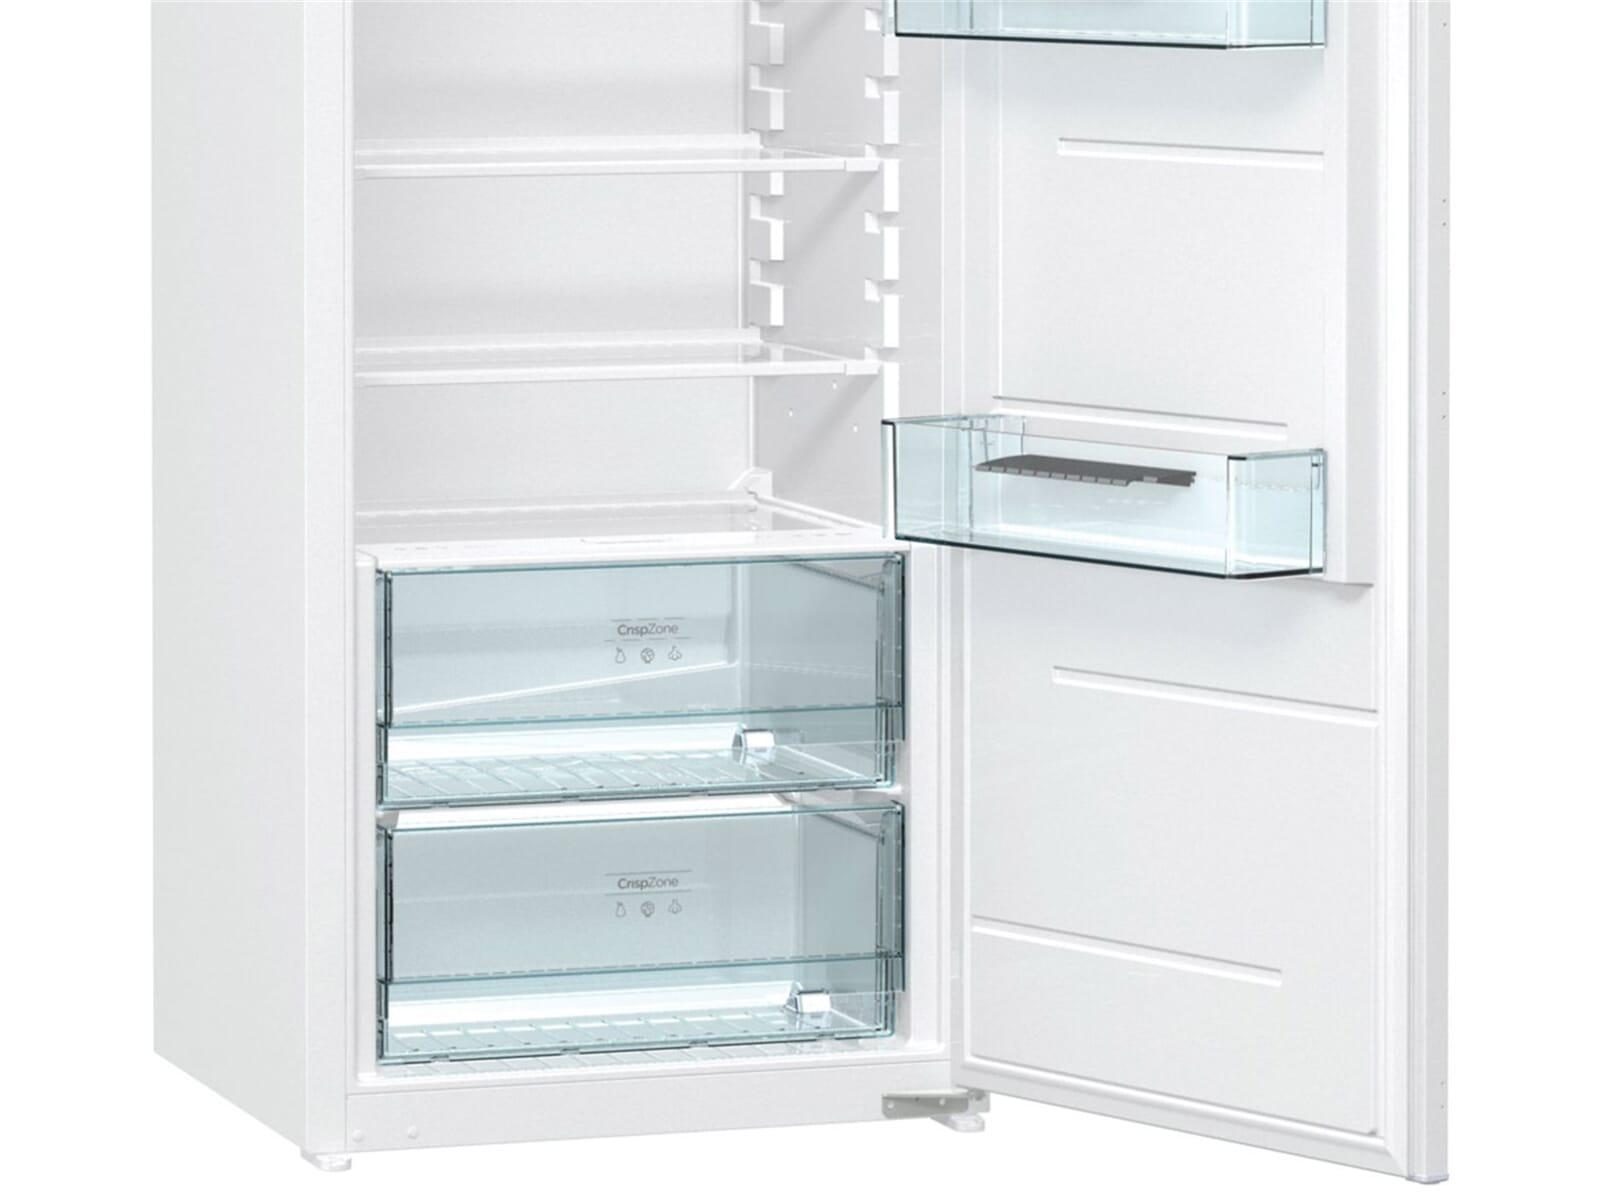 Gorenje Kühlschrank Schublade : Gorenje ri e einbaukühlschrank